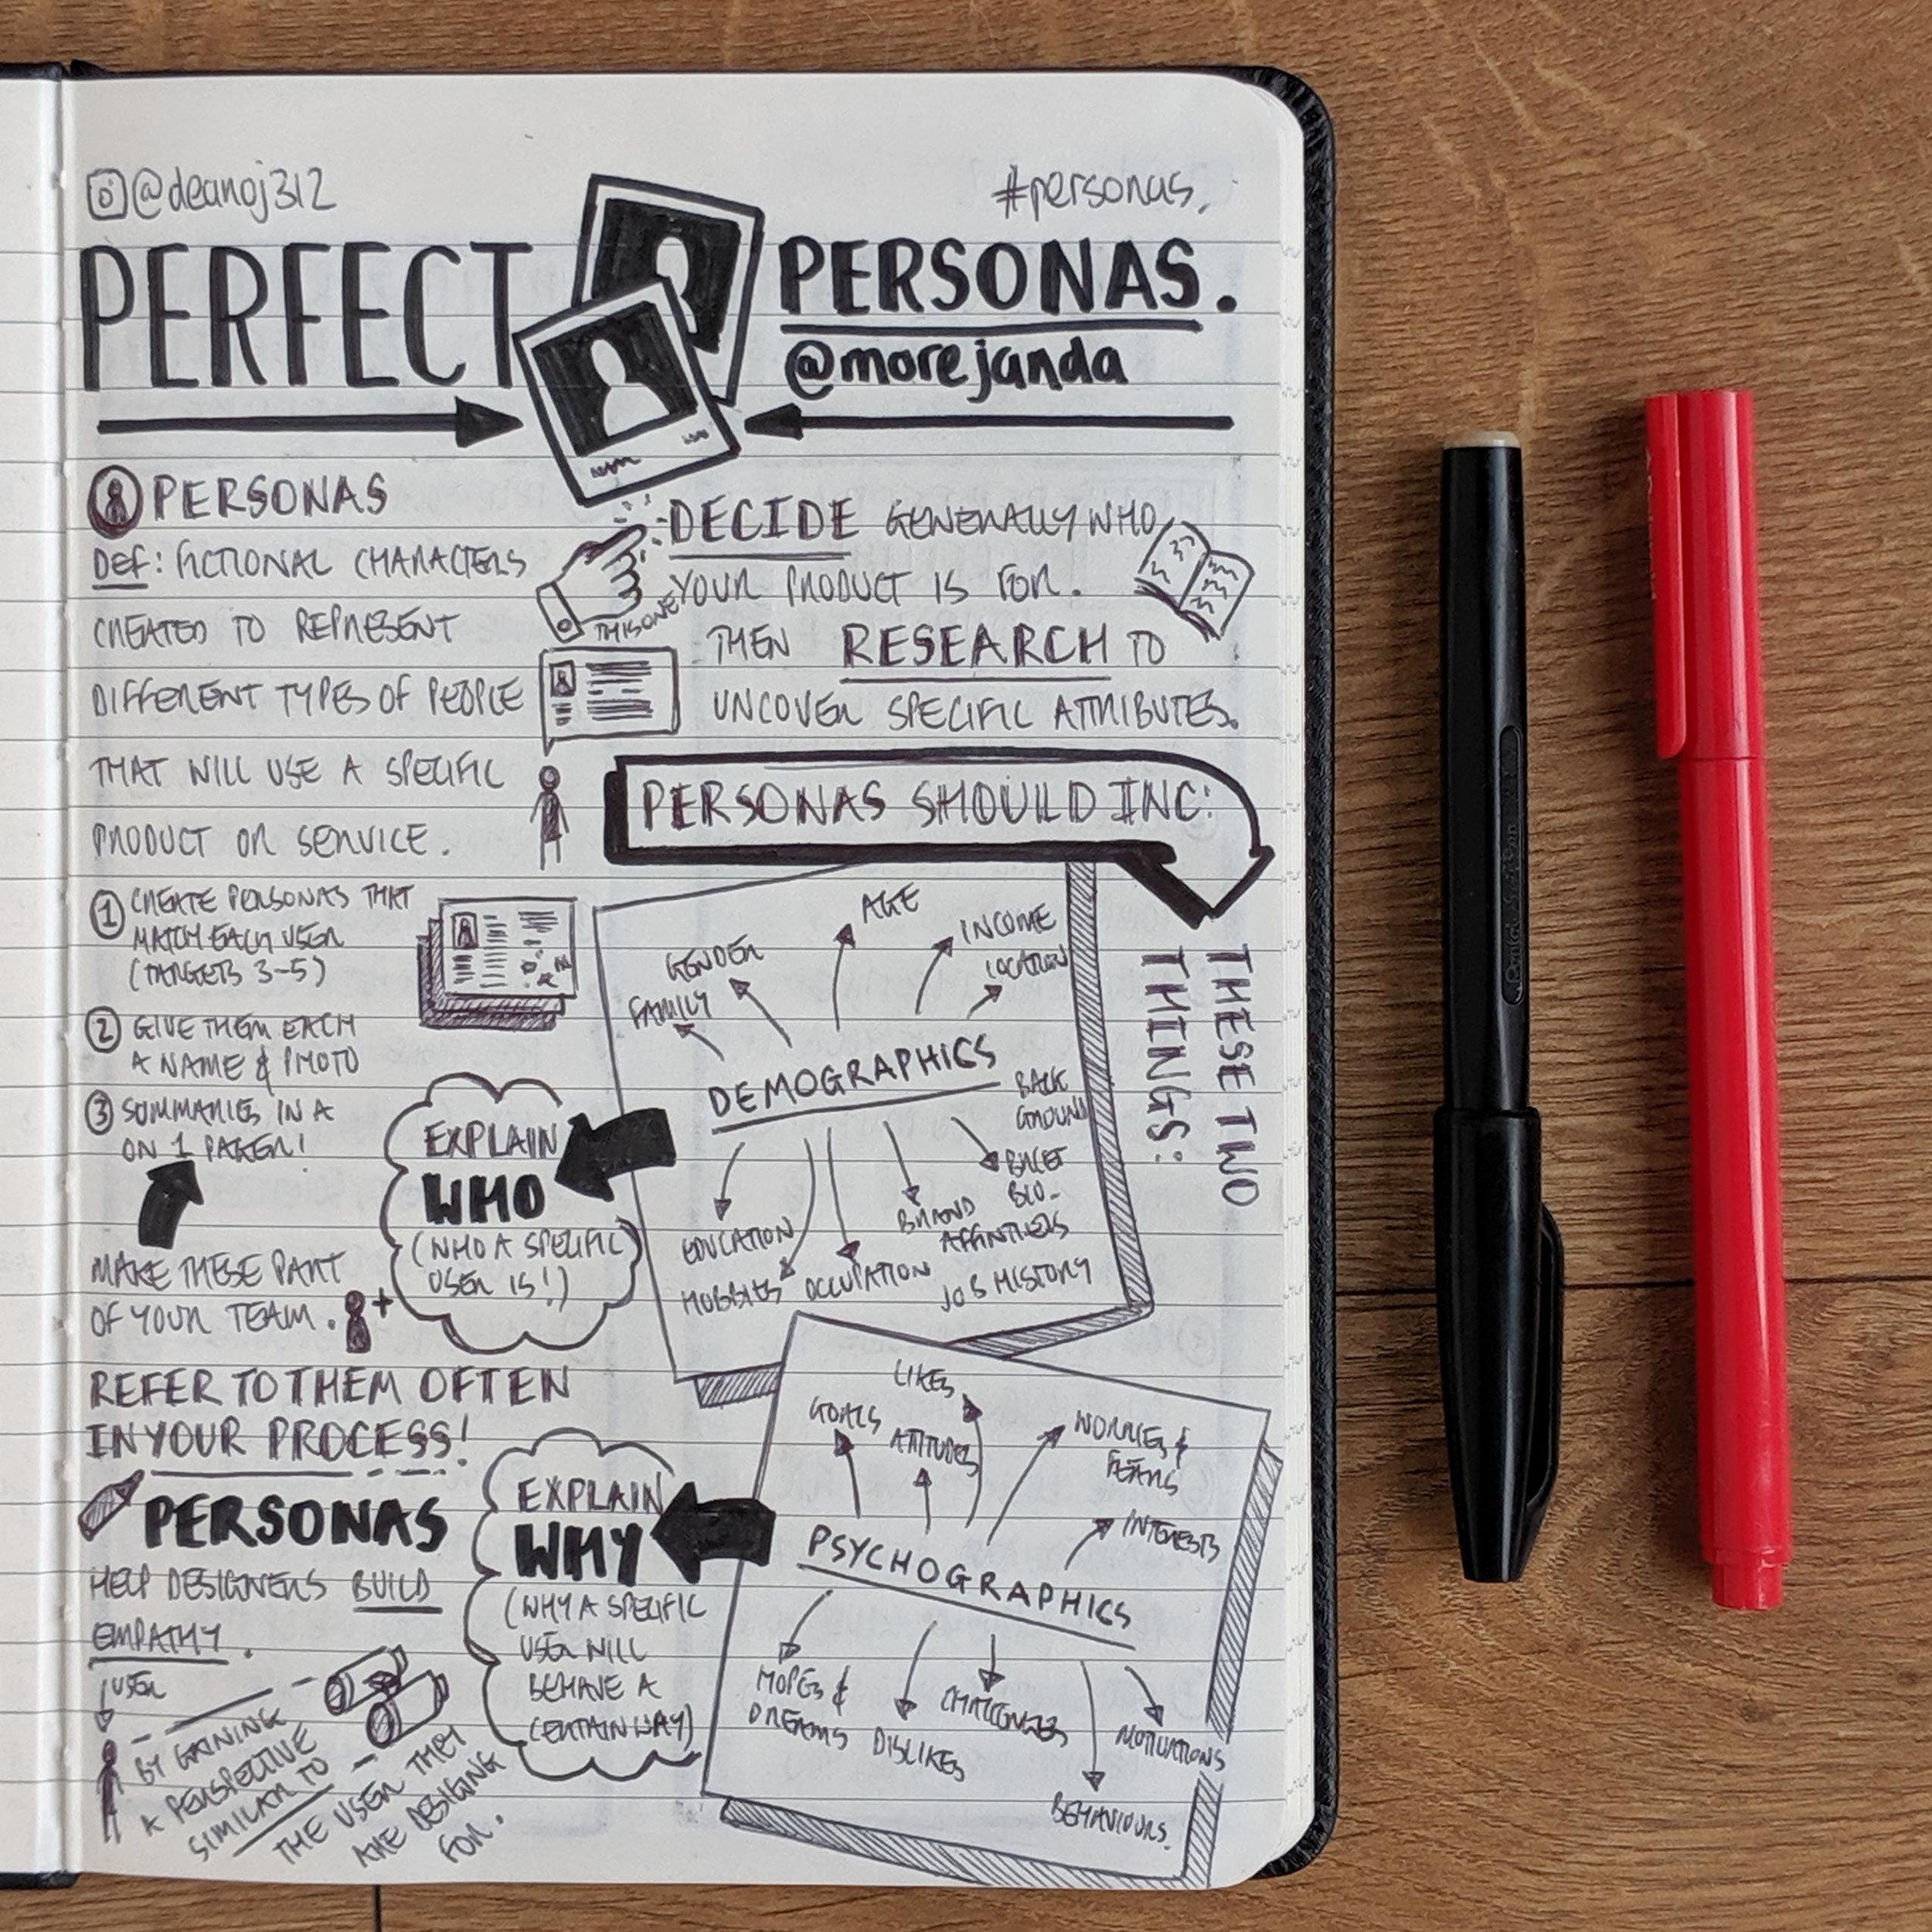 PerfectPersonas1.jpg